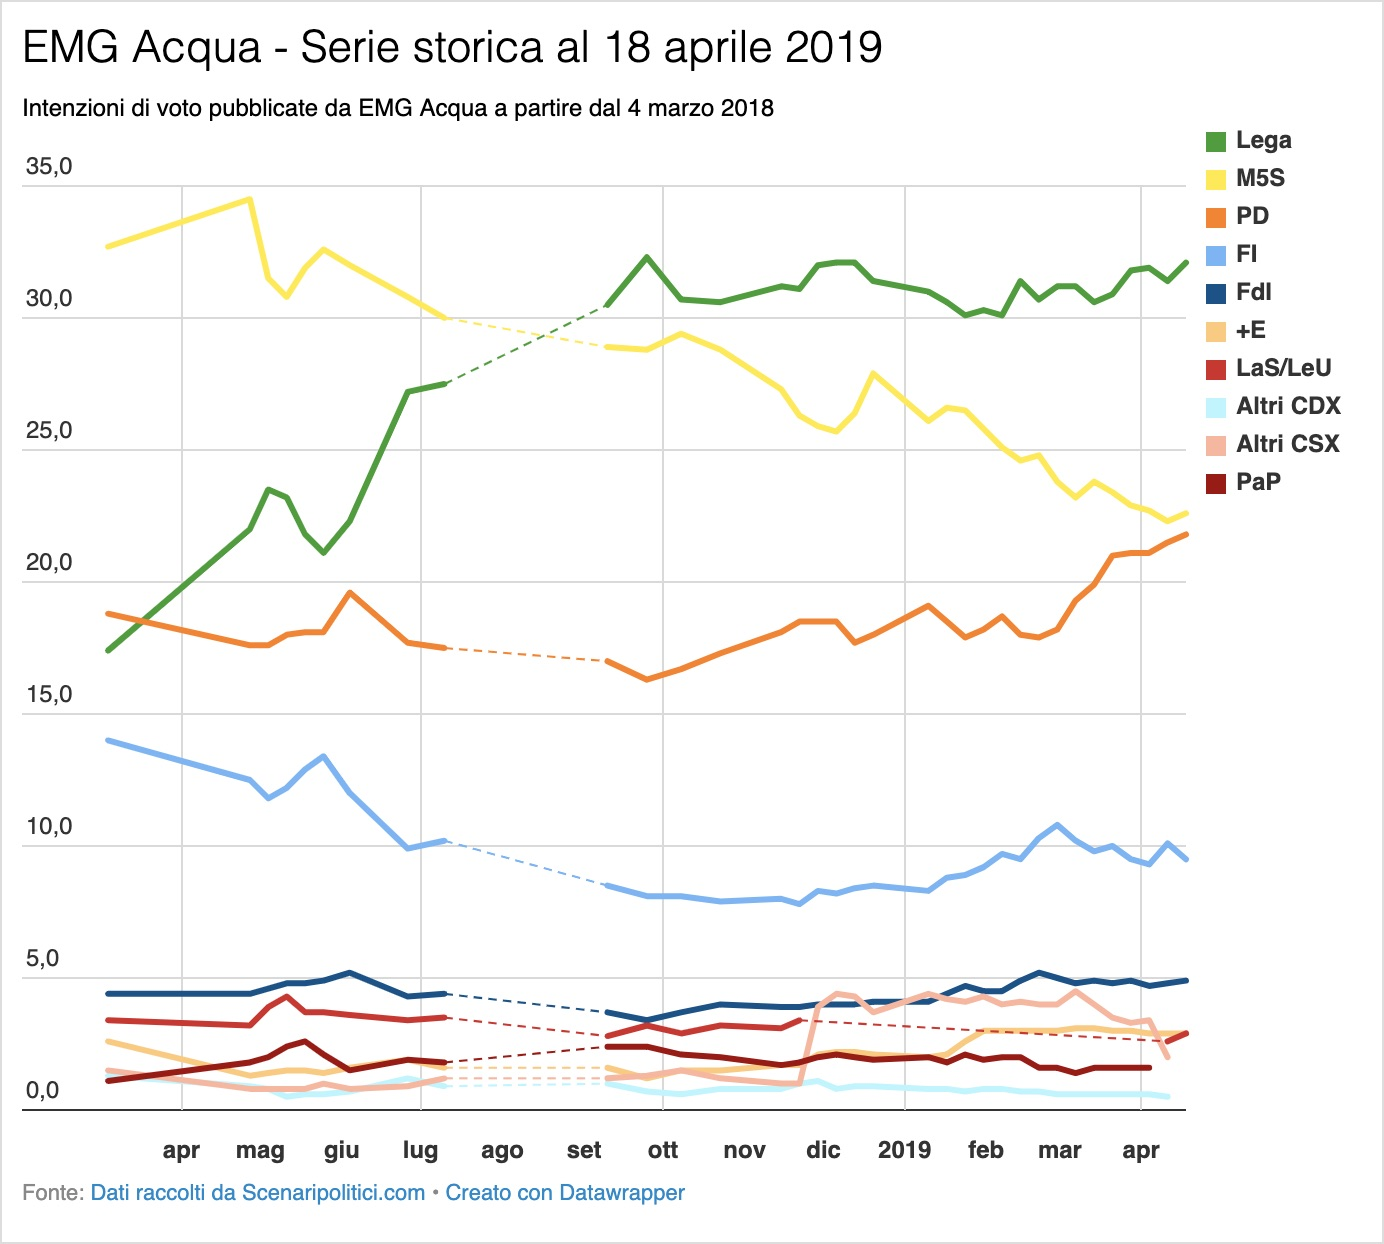 Sondaggio EMG Acqua 18 aprile 2019